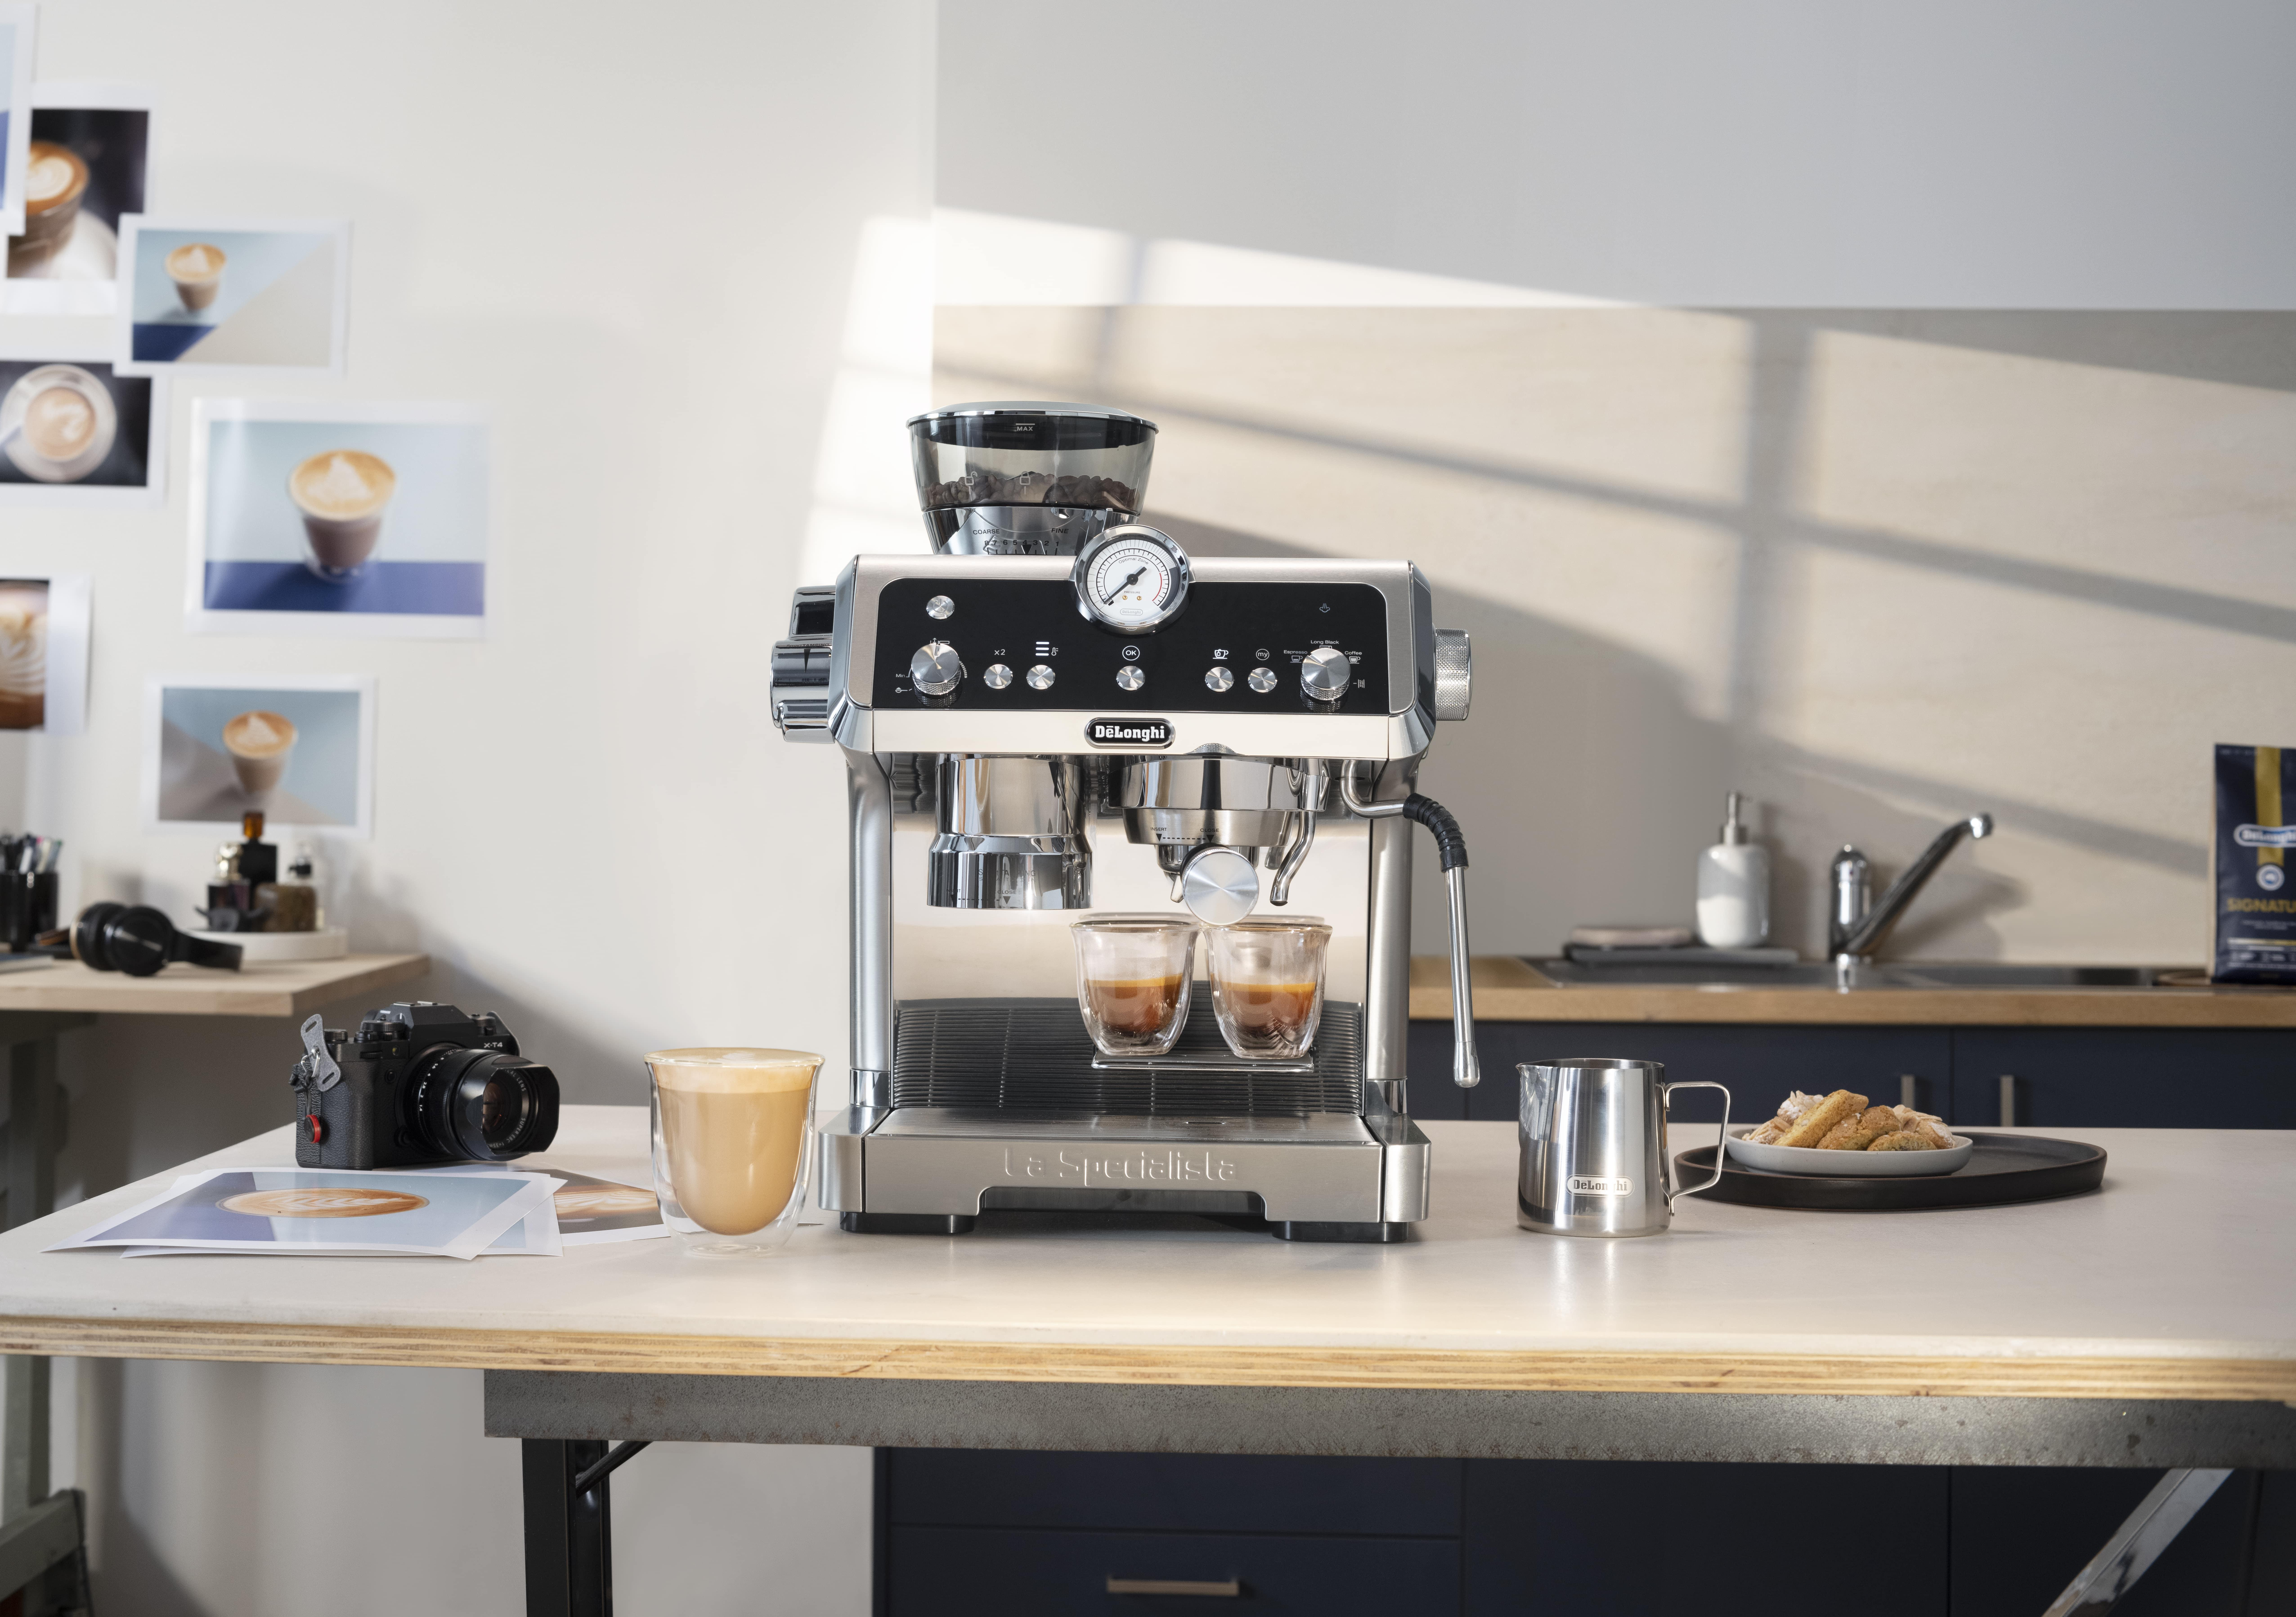 Craft your coffee the best way with La Specialista Prestigio, De'Longhi's latest premium coffee machine